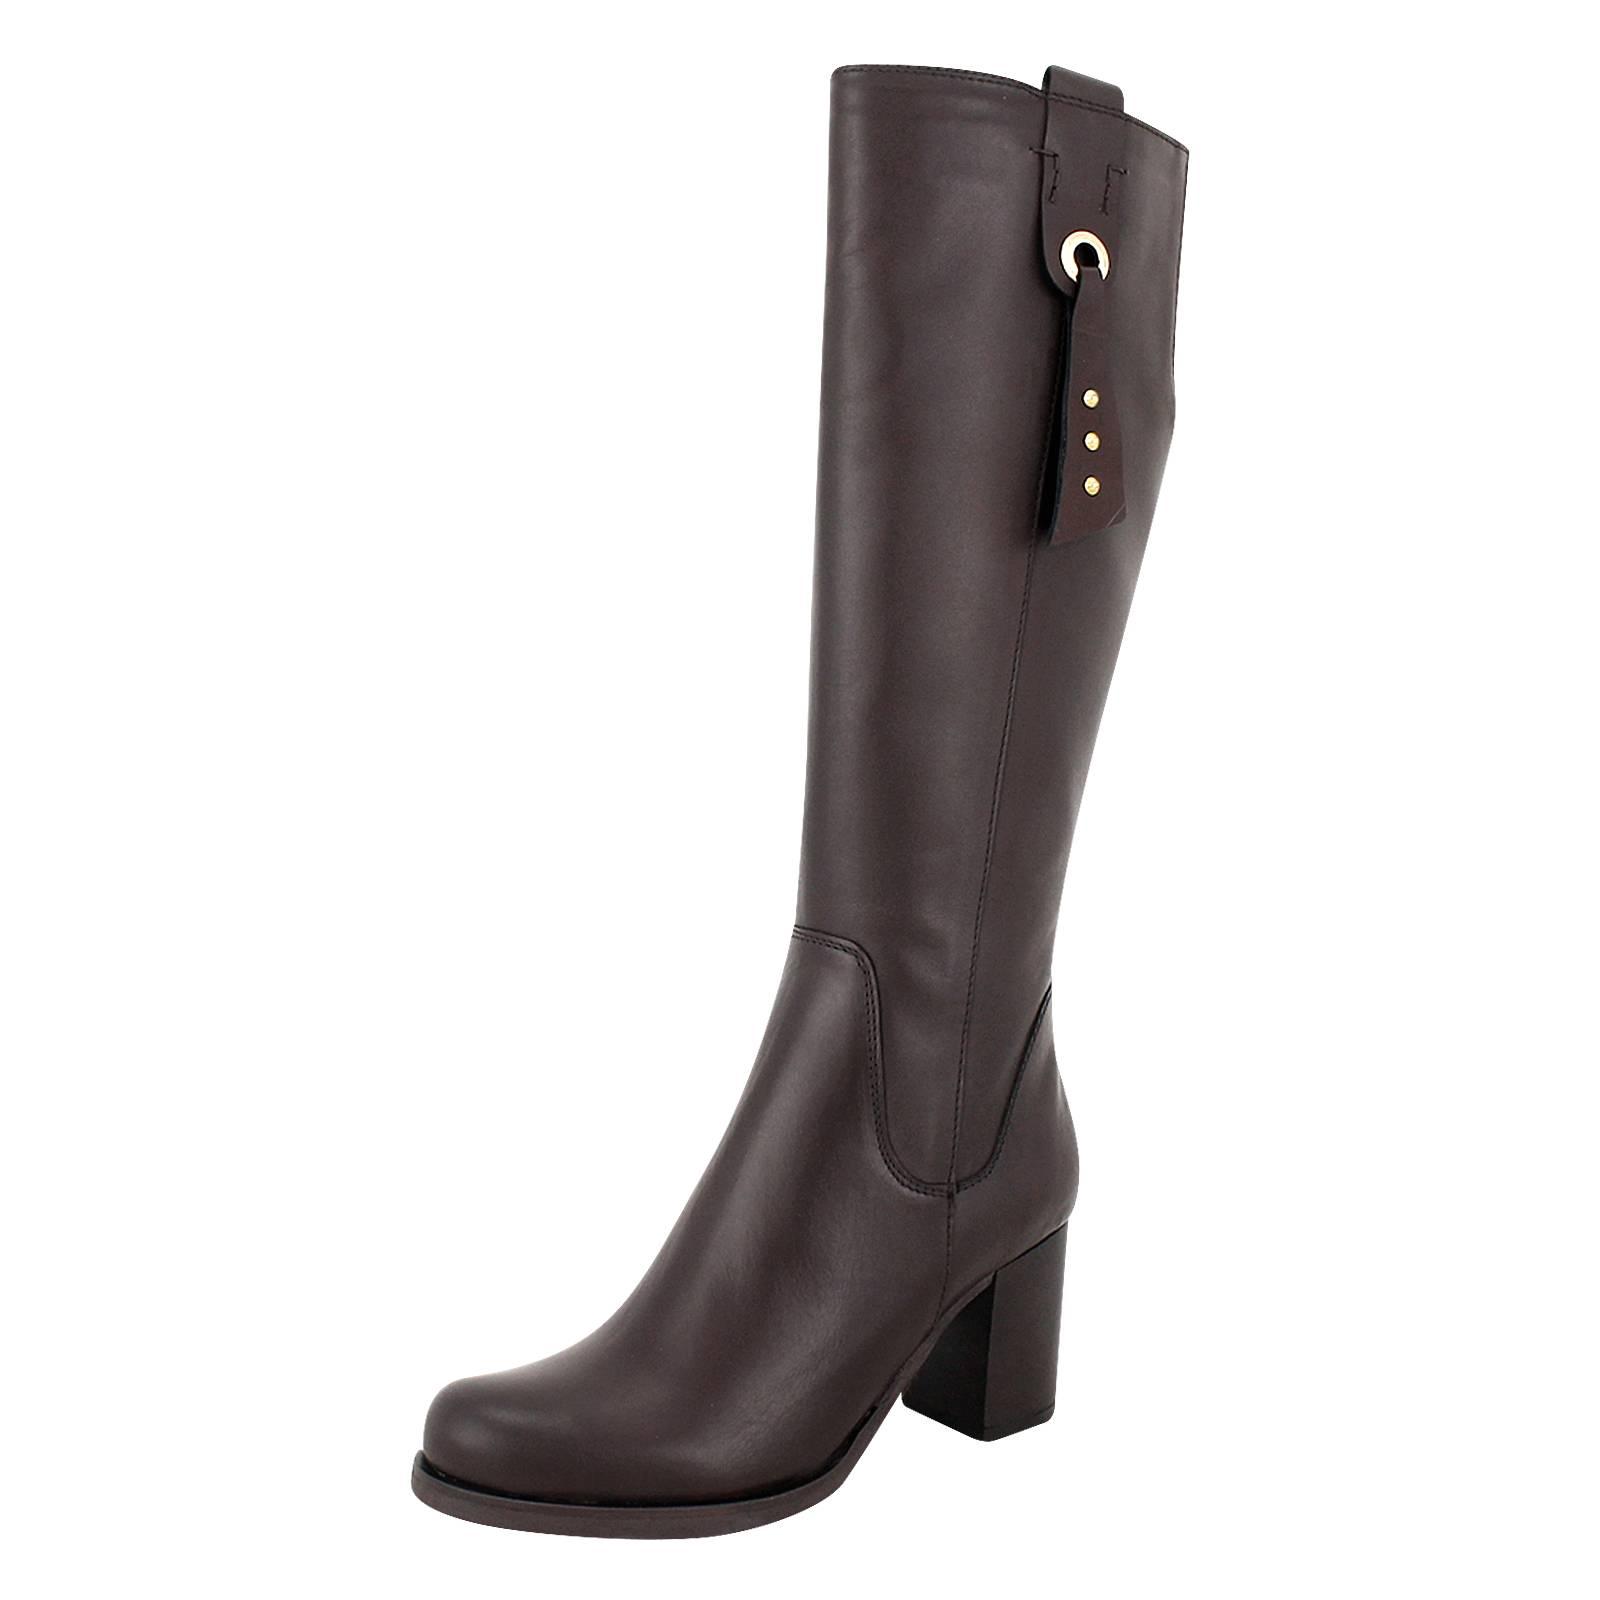 Barwick - Esthissis Women s boots made of leather - Gianna Kazakou ... 96822ca8adf